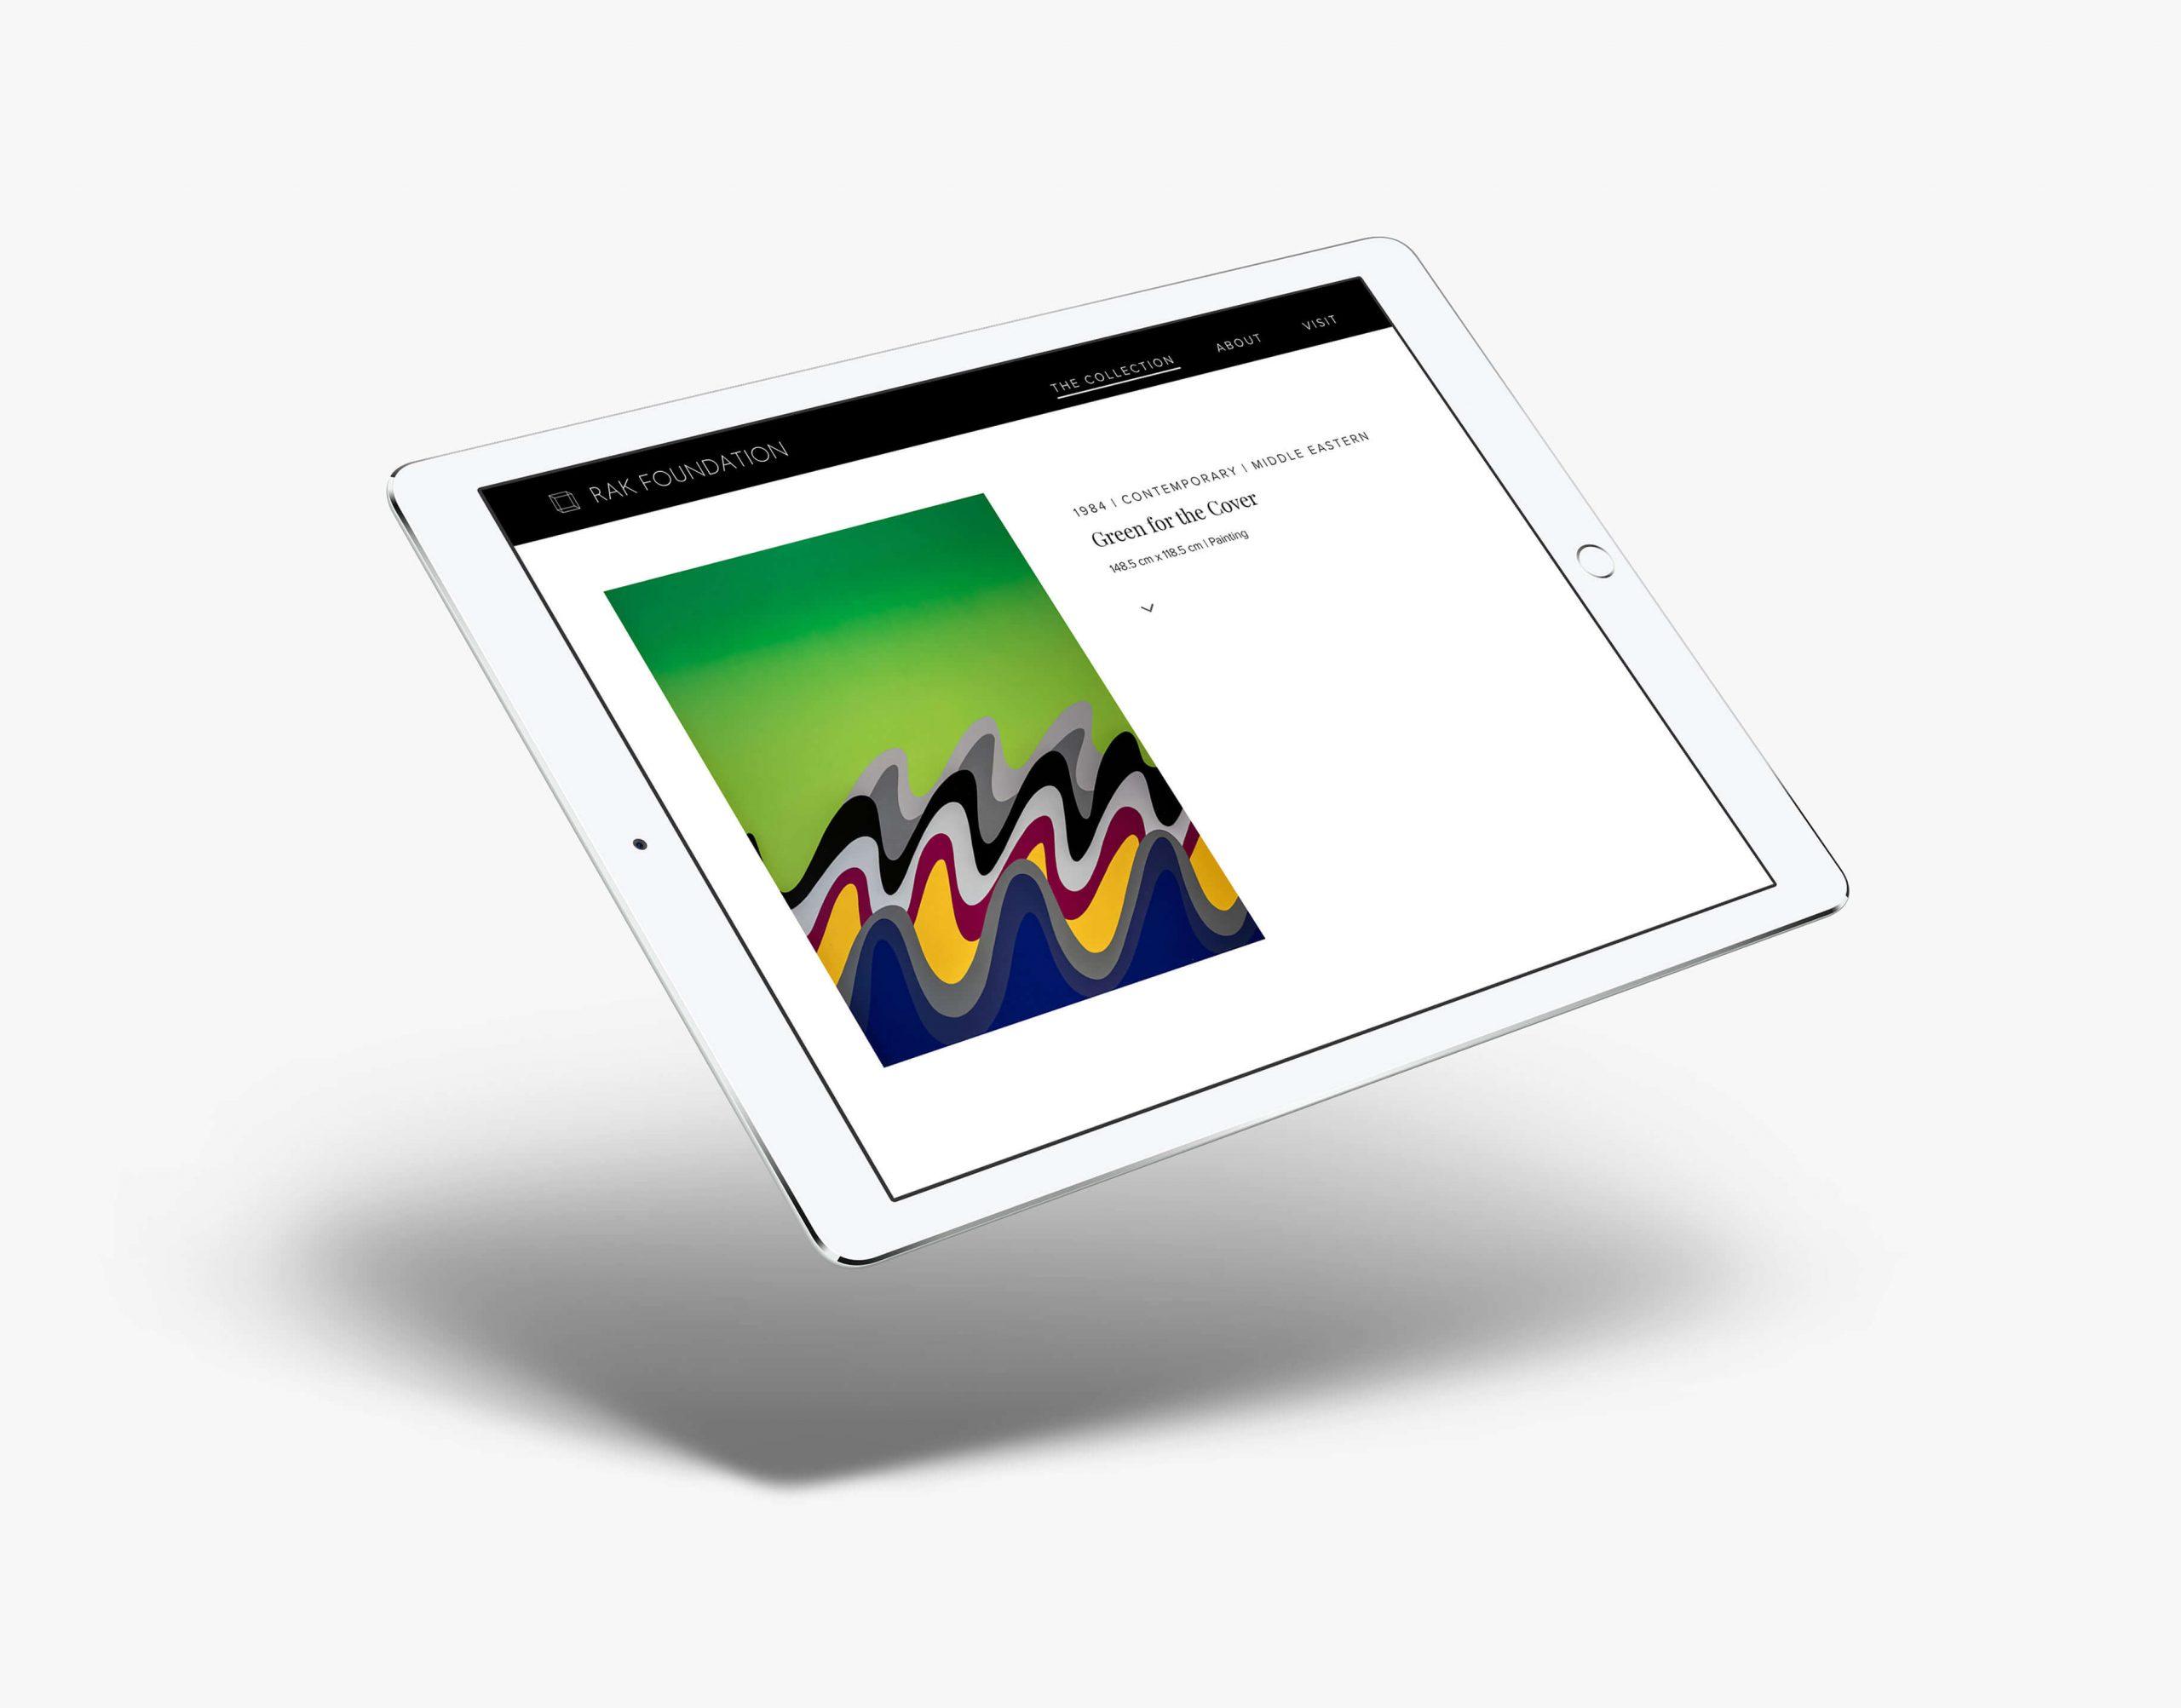 rak foundation web design landscape ipad